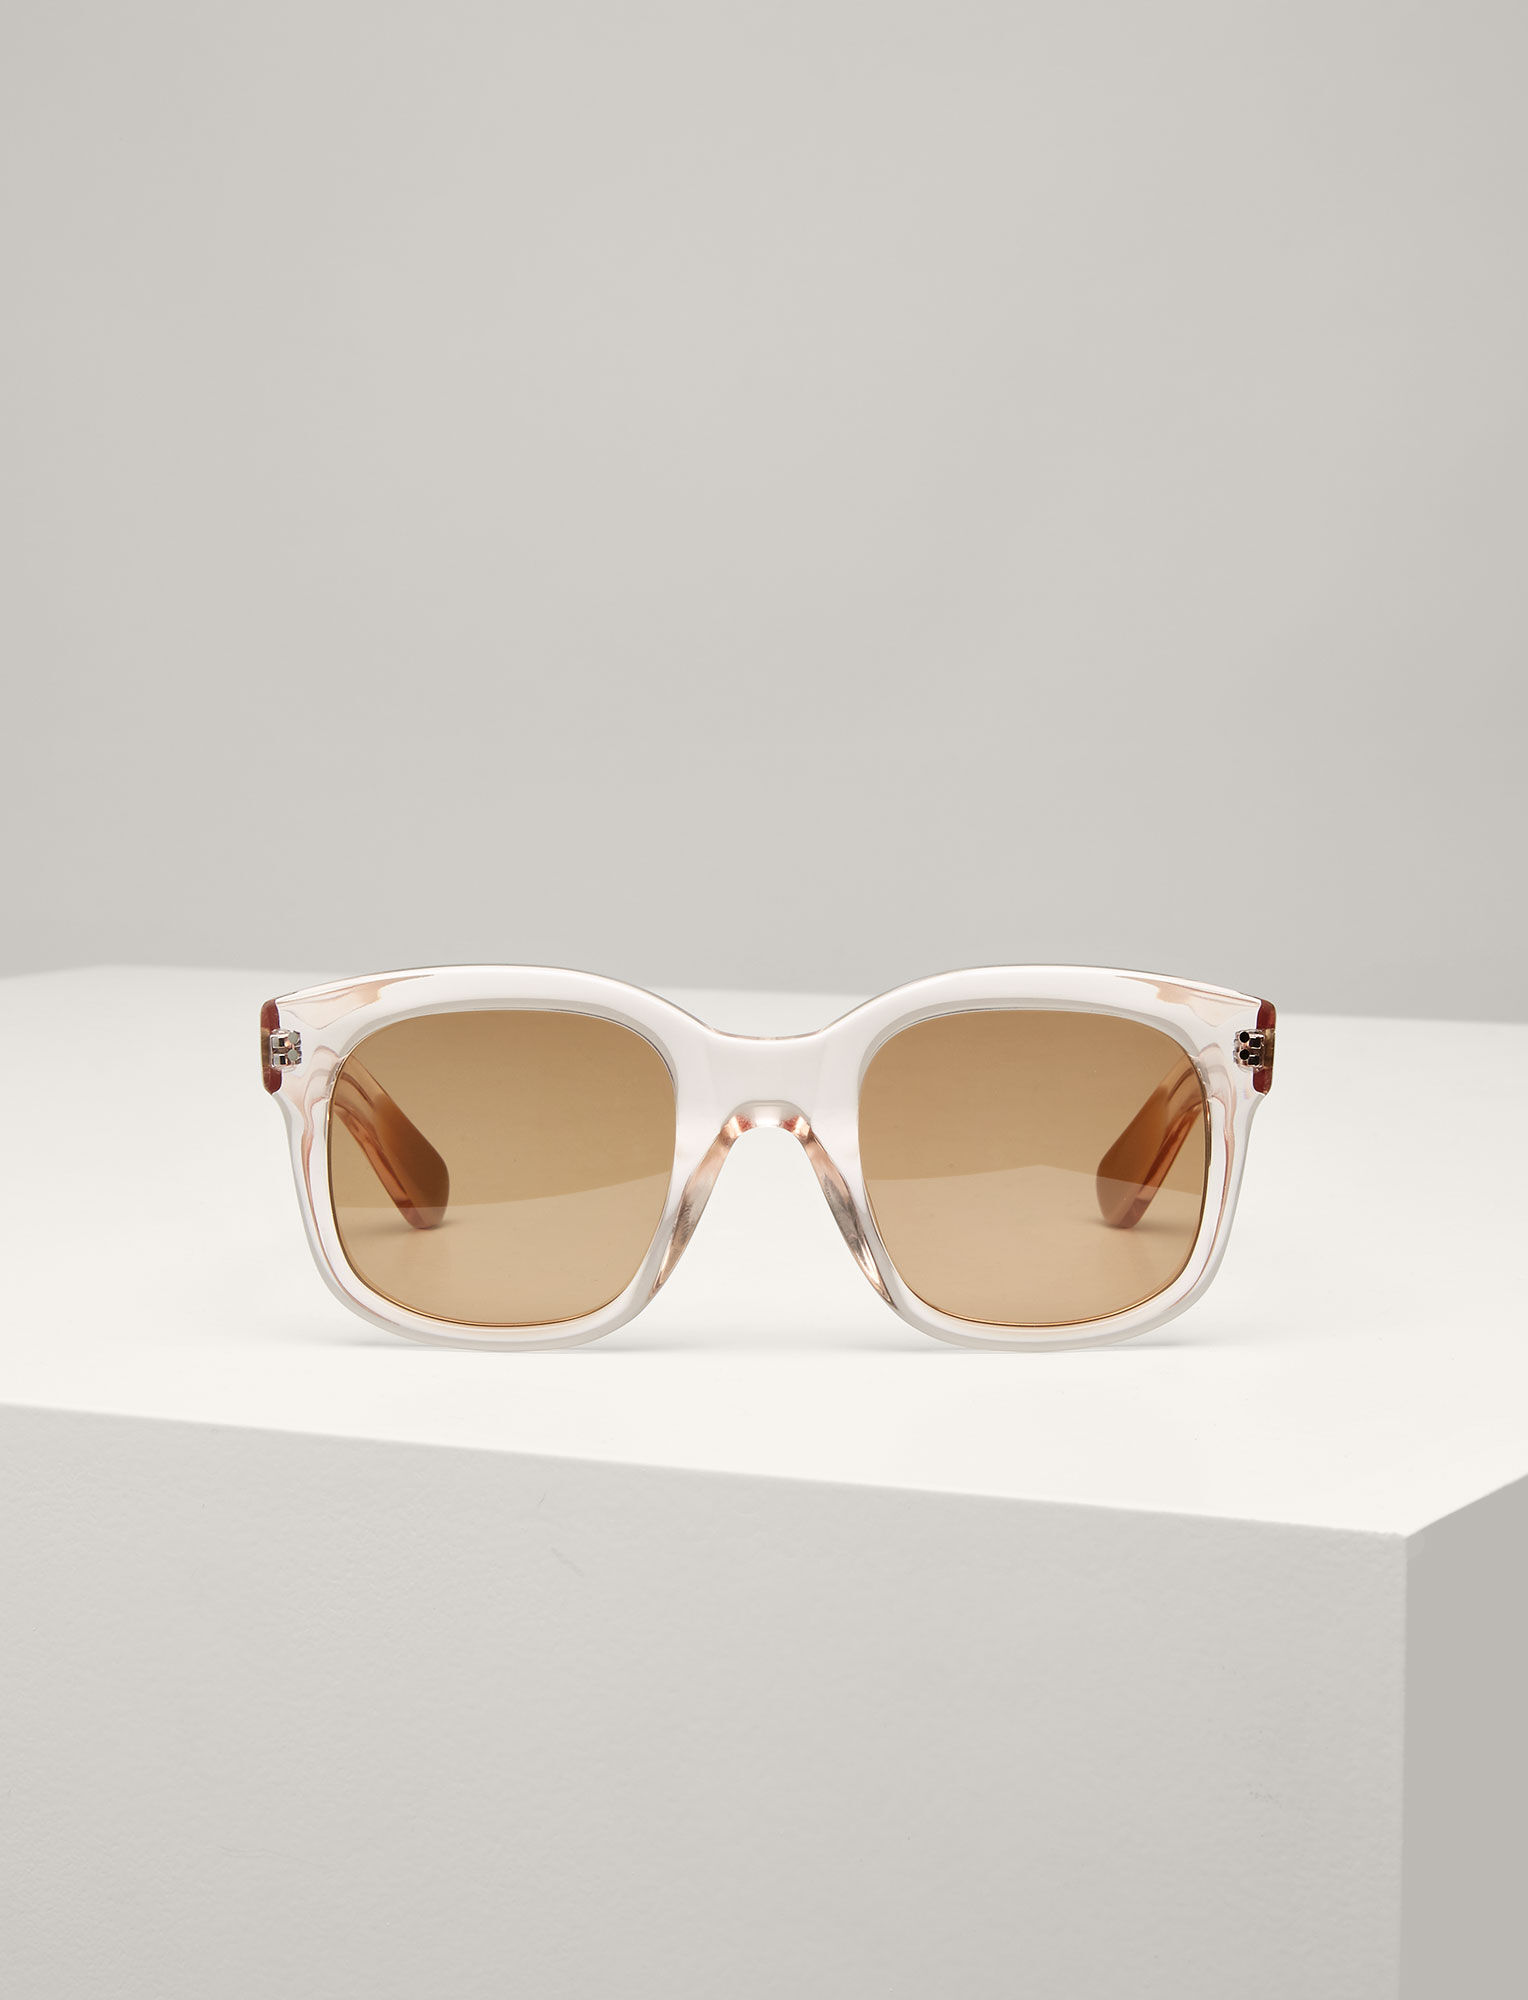 Joseph, Westbourne Sunglasses, in CARNATION